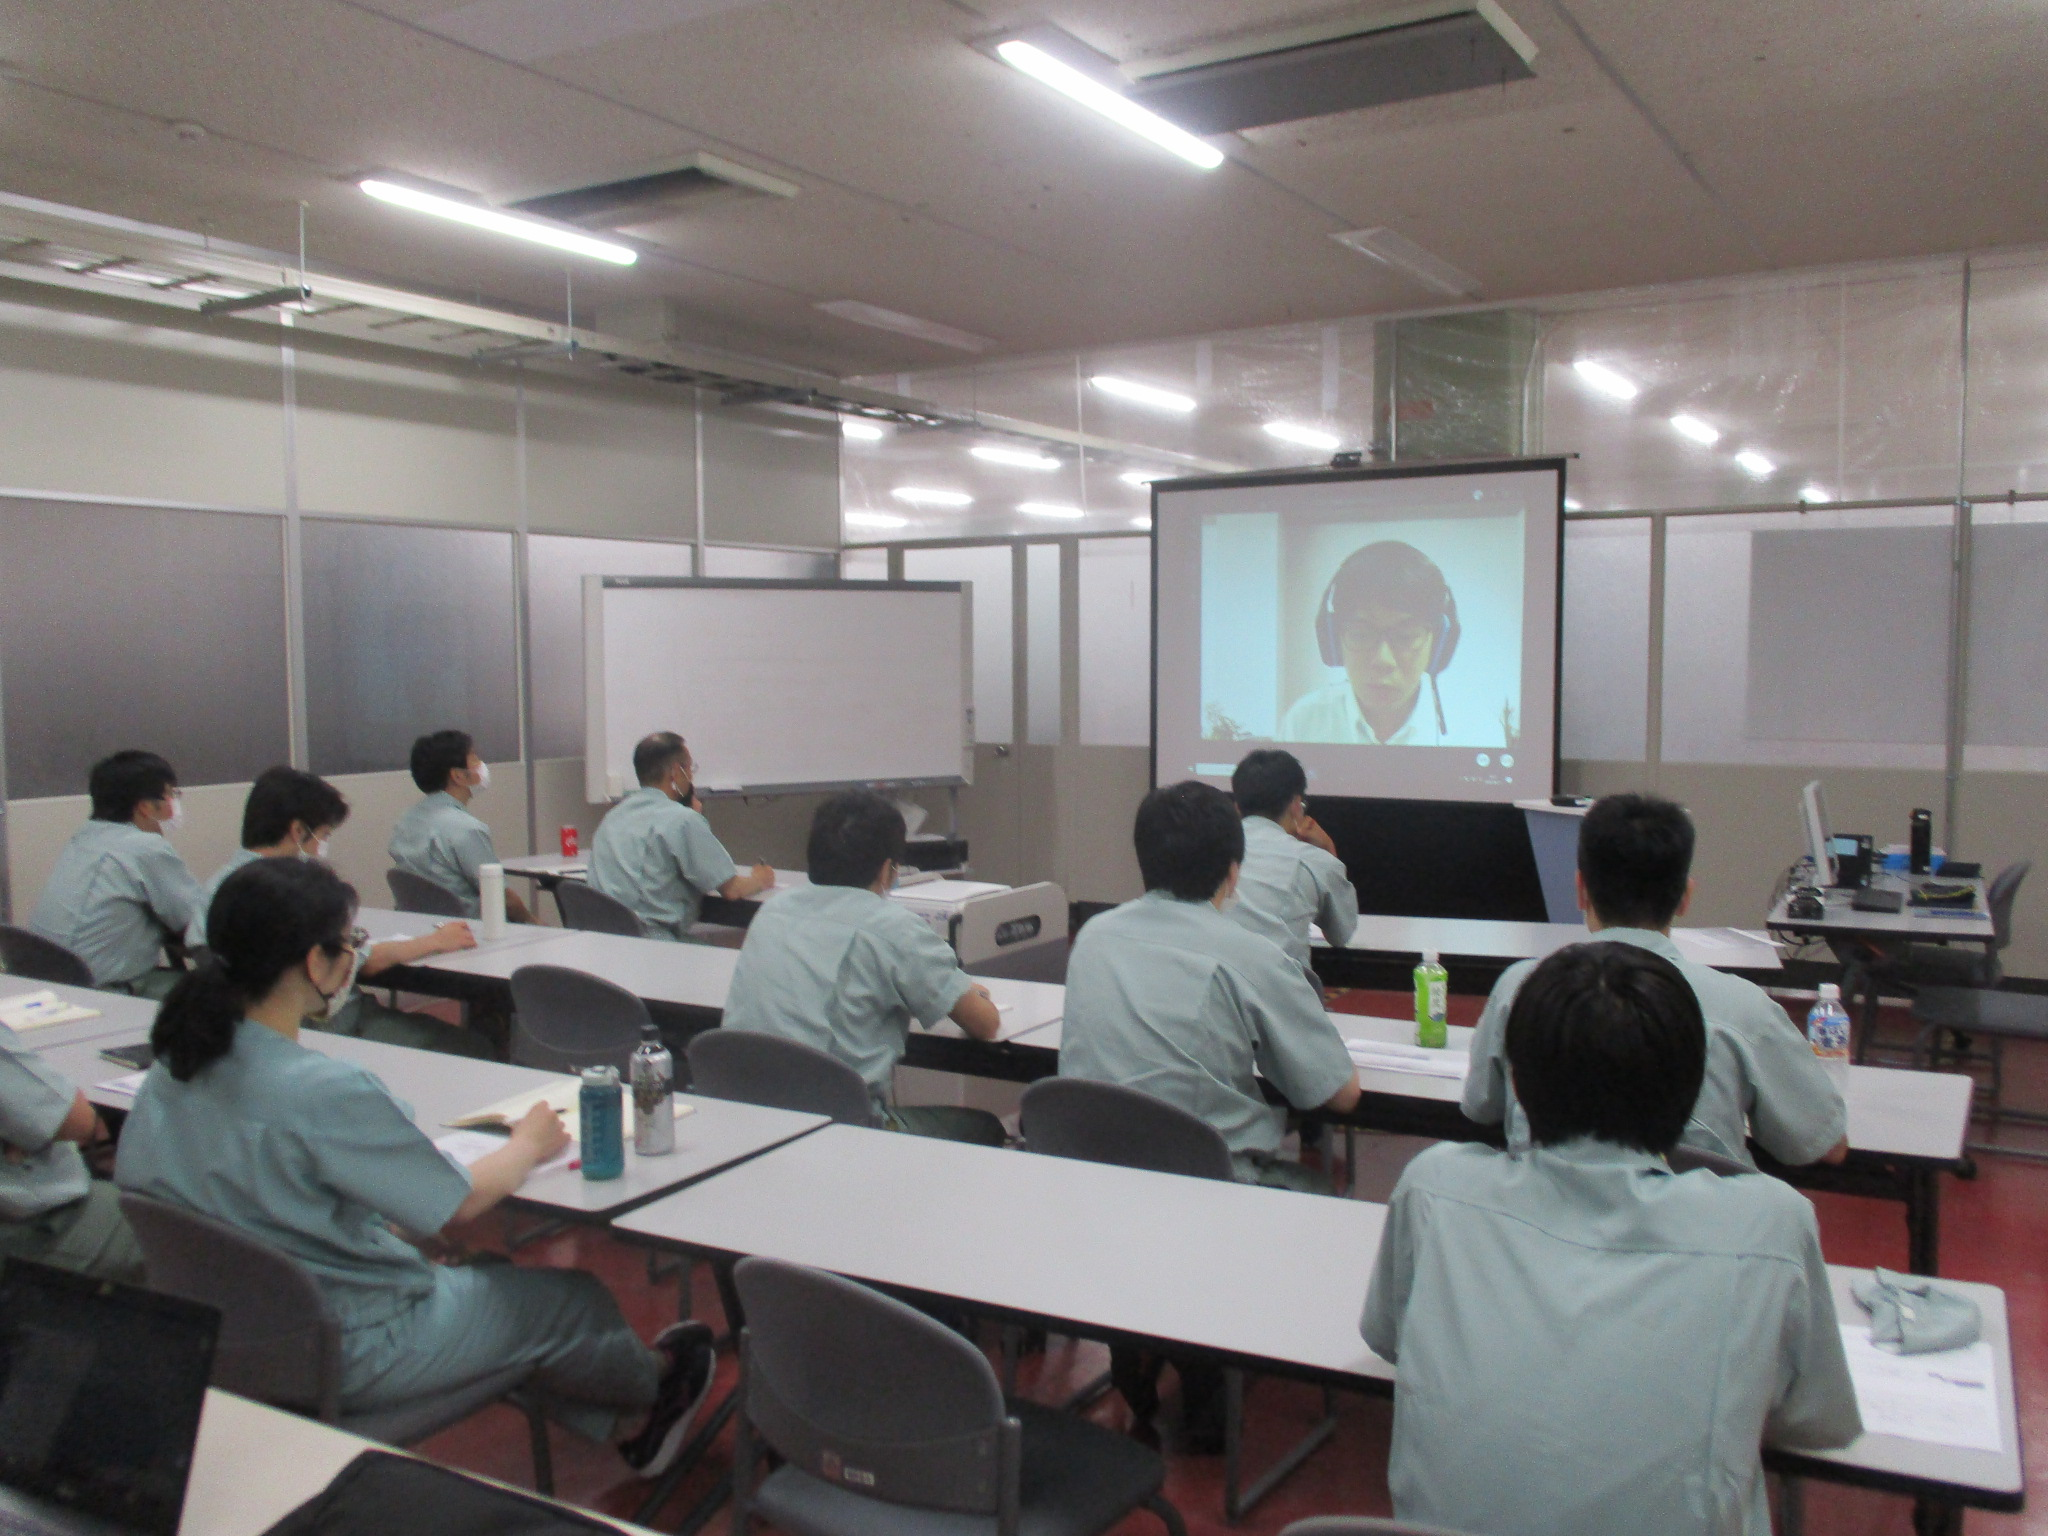 YKK株式会社にて企業人向けセミナーを実施しました。